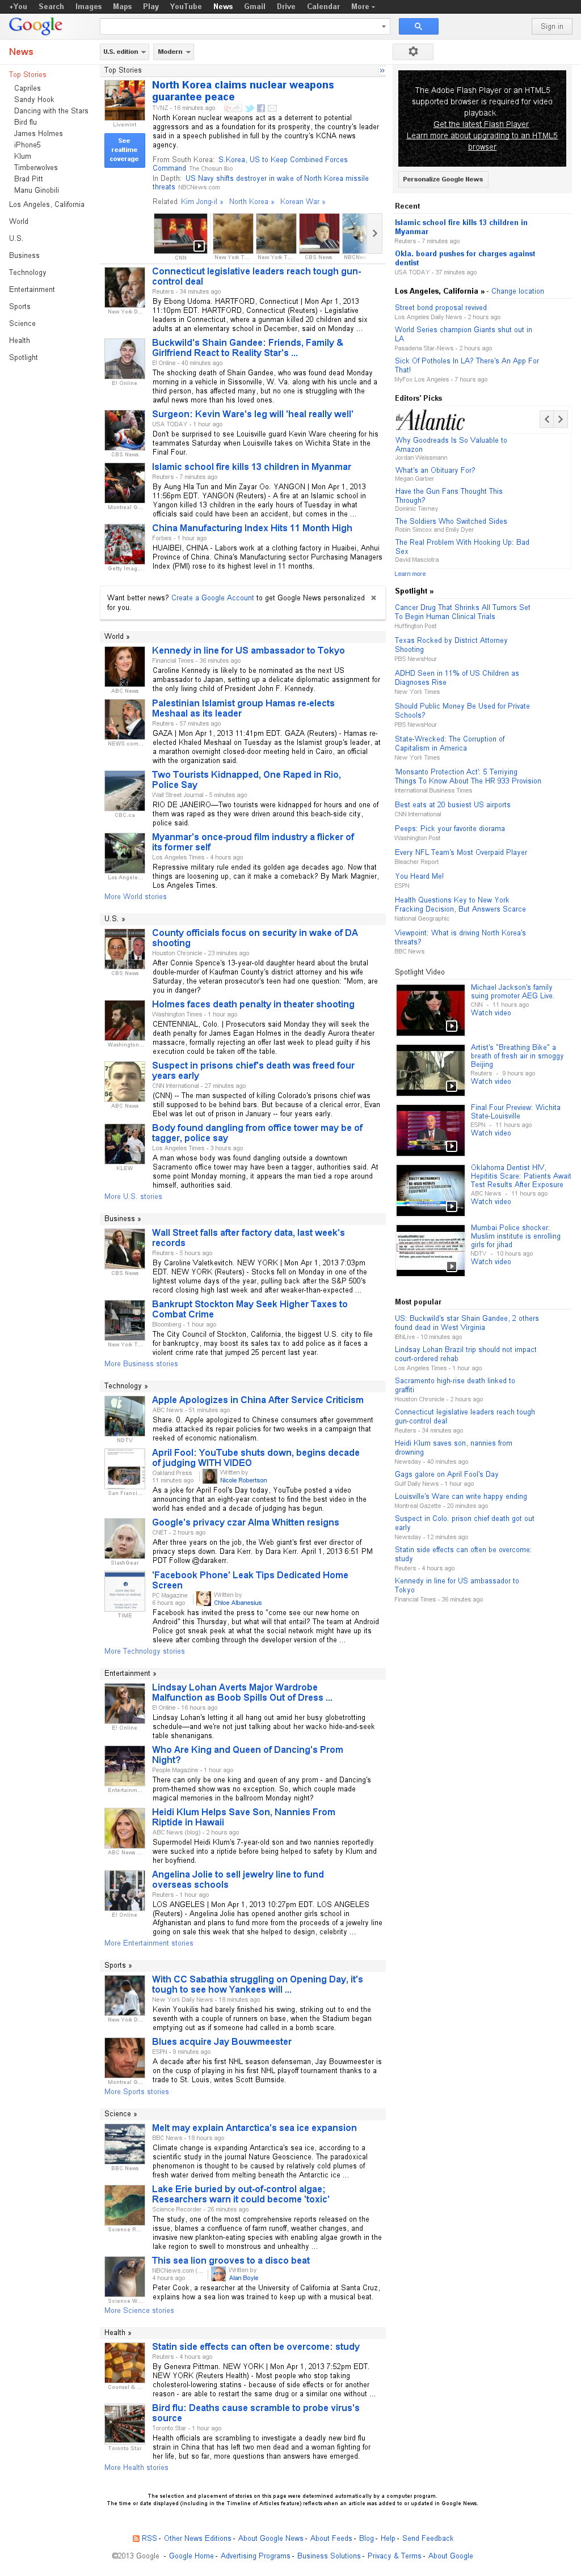 Google News at Tuesday April 2, 2013, 4:07 a.m. UTC